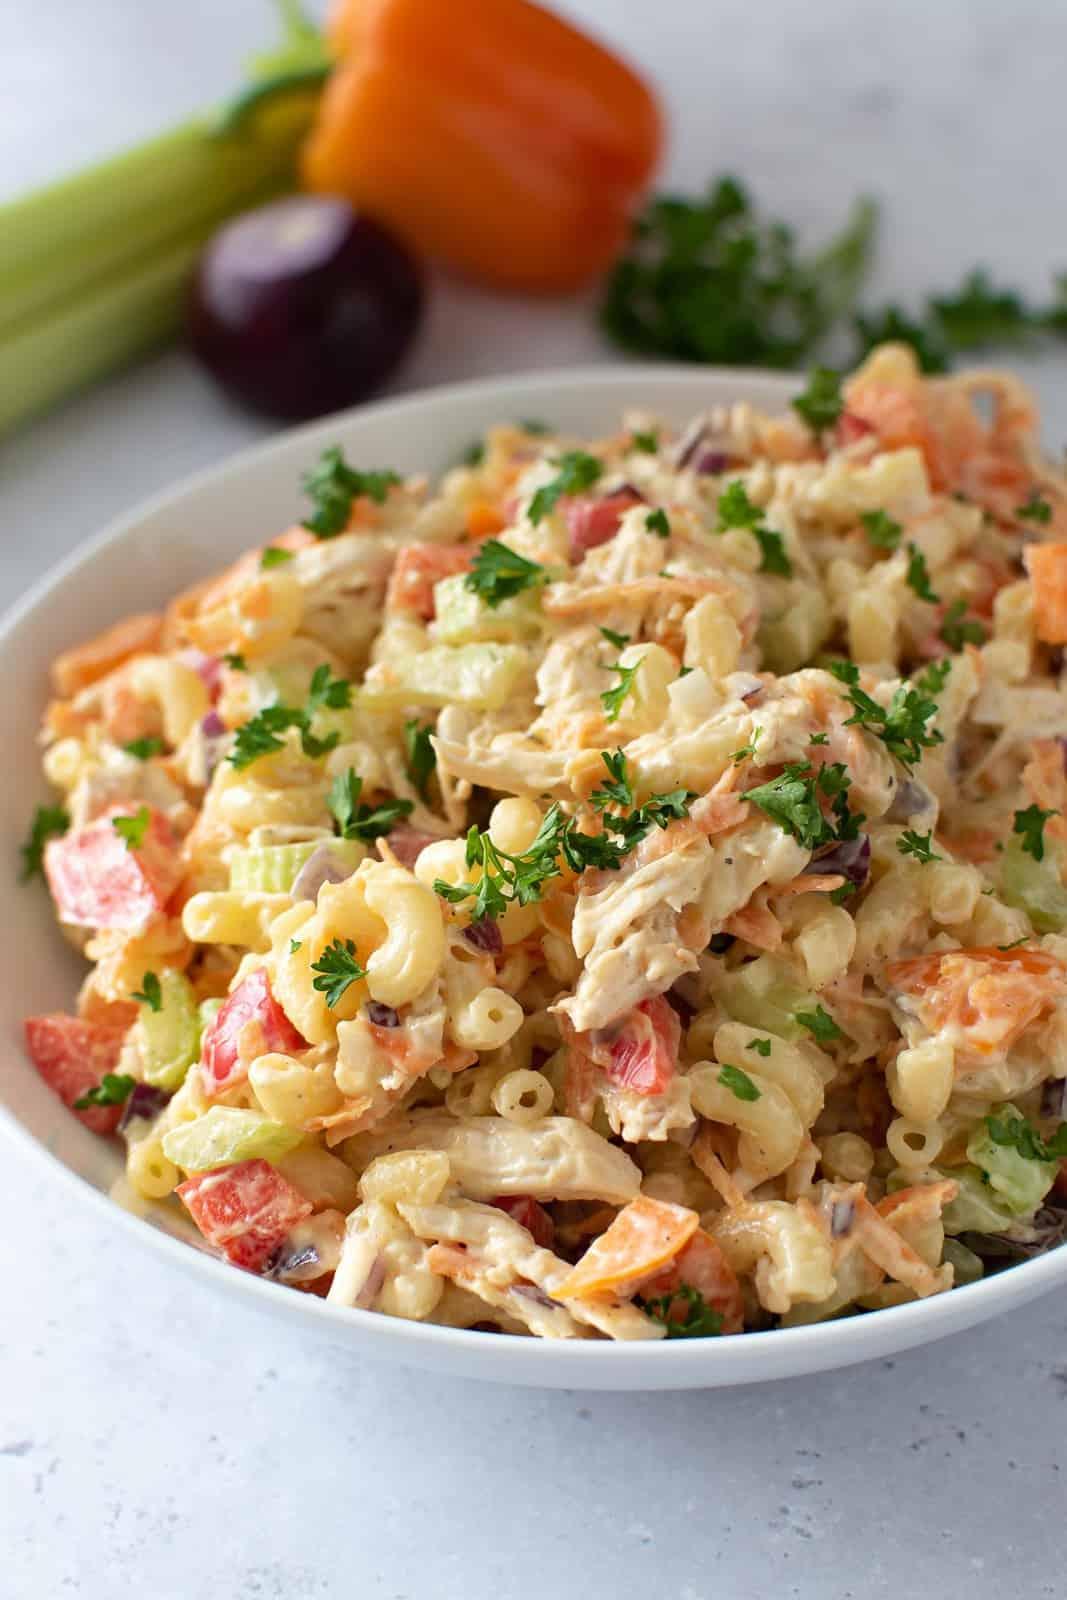 A bowl of chicken macaroni salad.